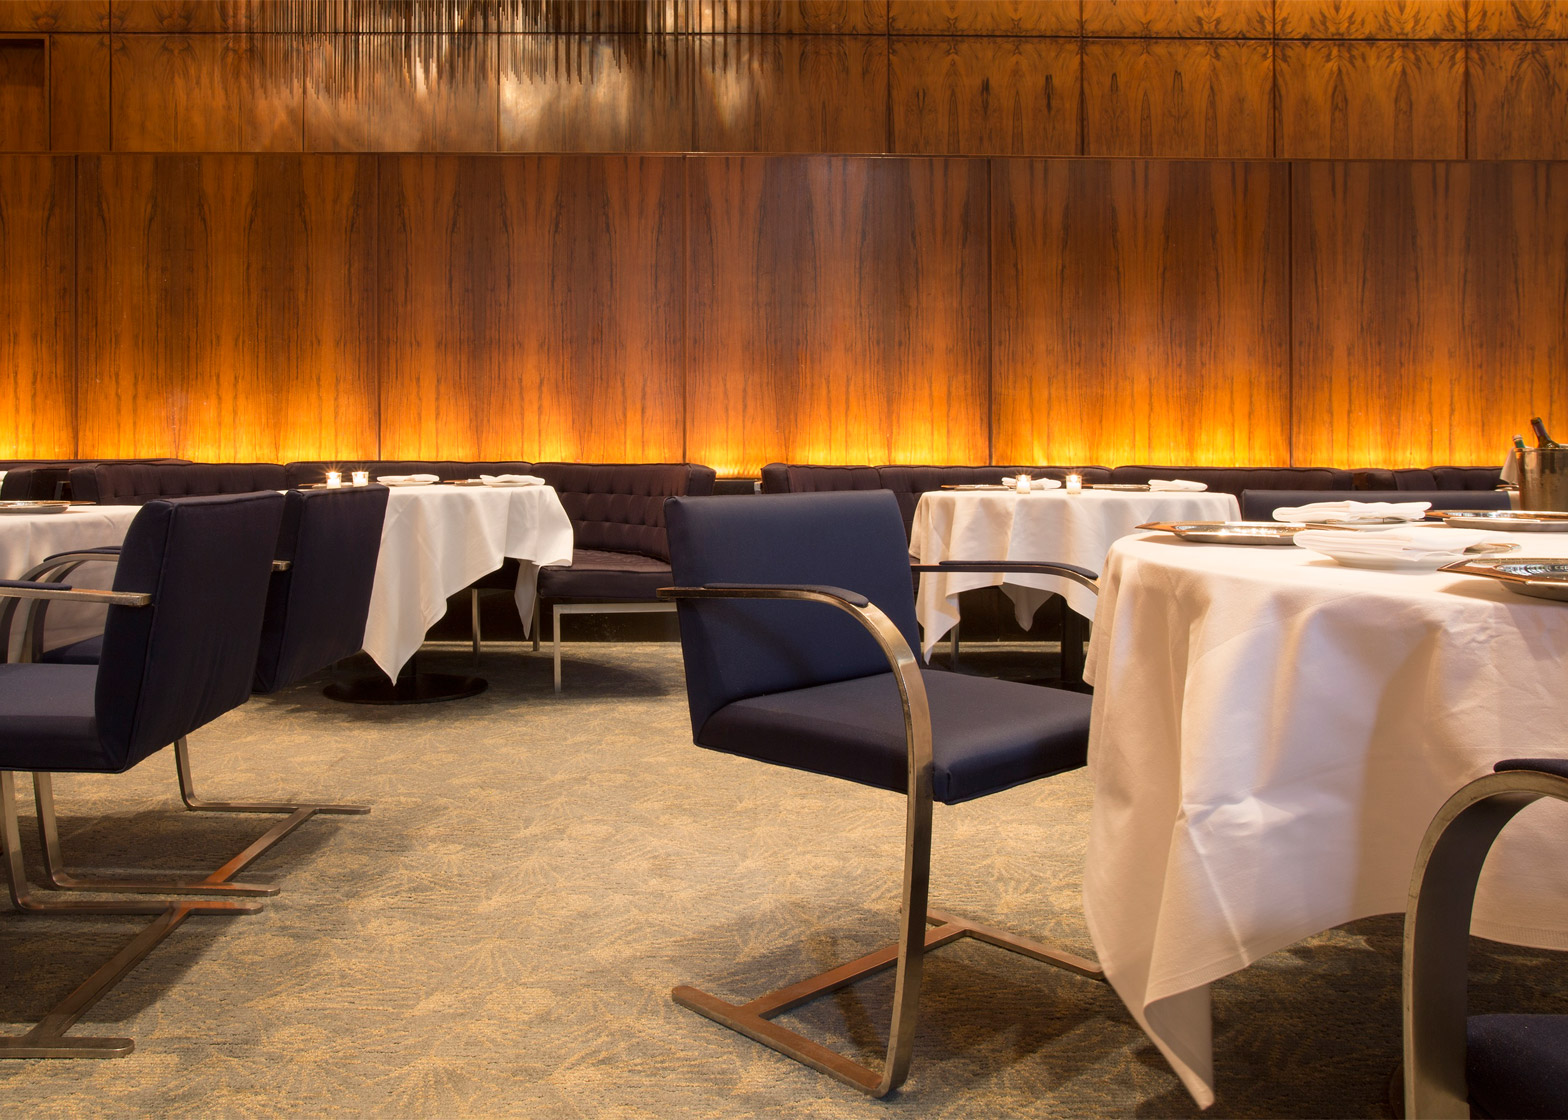 four-seasons-restaurant-interior-seagram-building-philip-johnson-mies-van-der-rohe-auction-new-york-city-usa-news_dezeen_1568_4